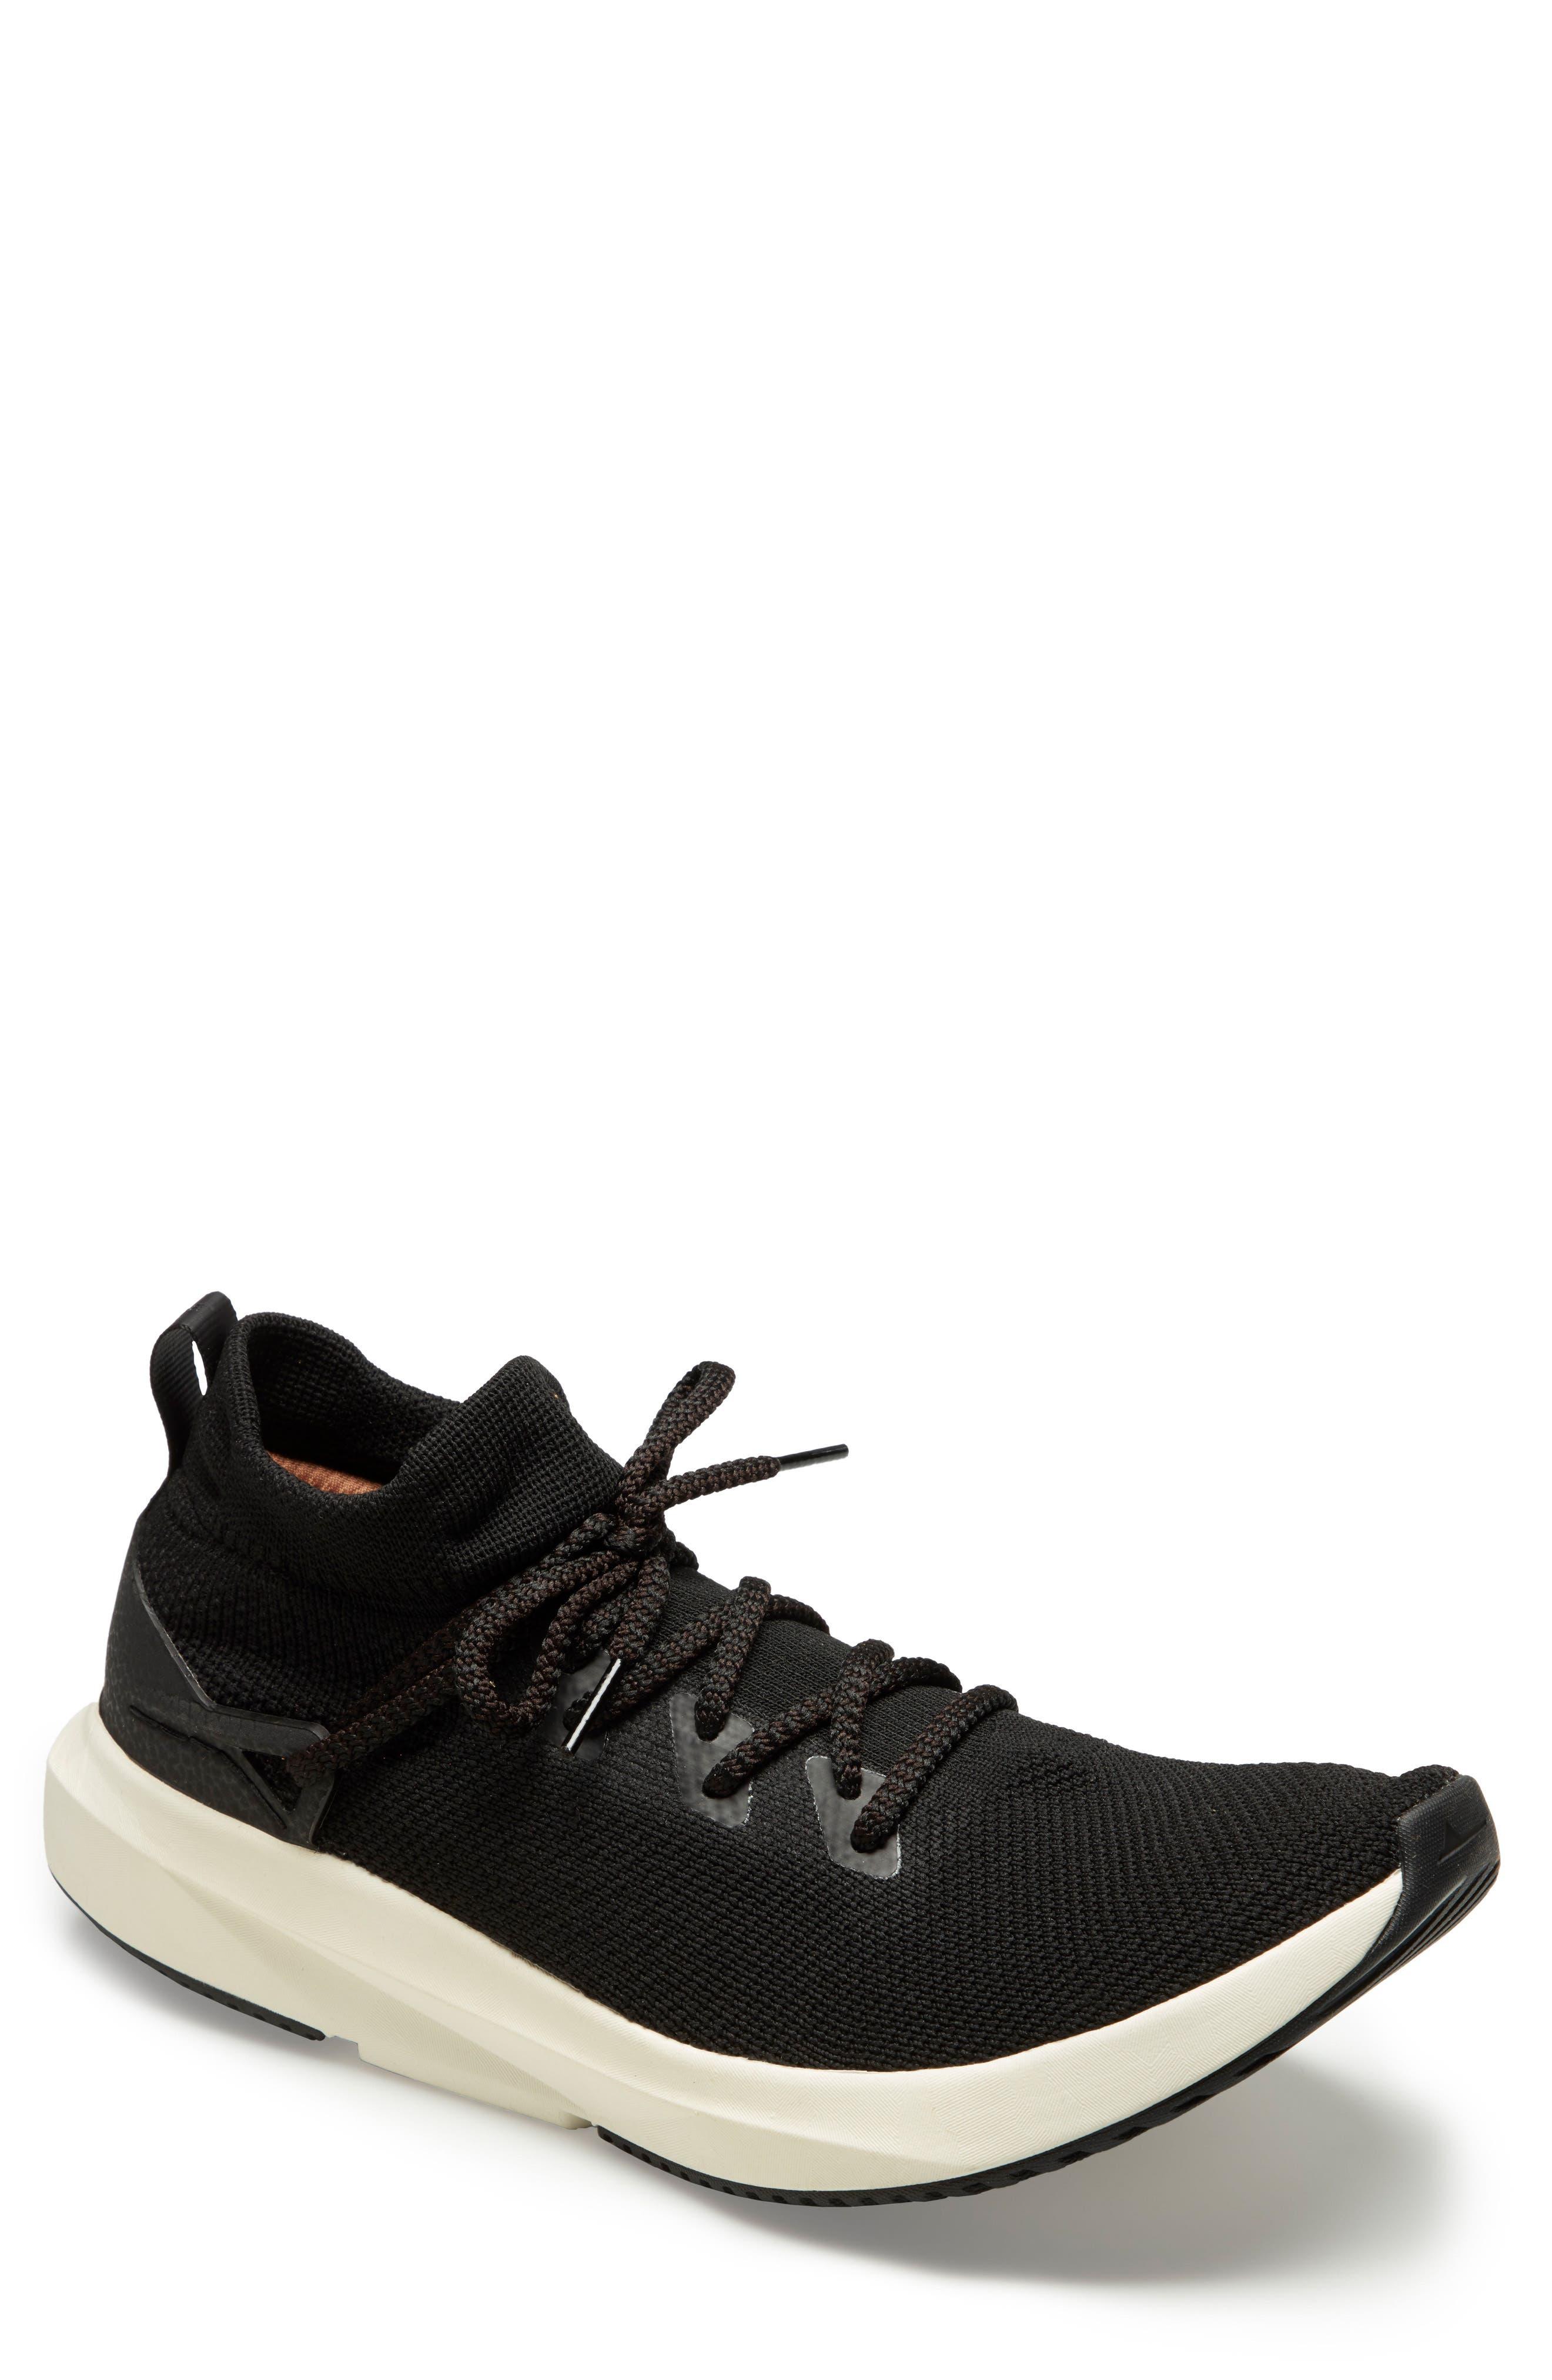 Kaze Sneaker,                             Main thumbnail 1, color,                             011